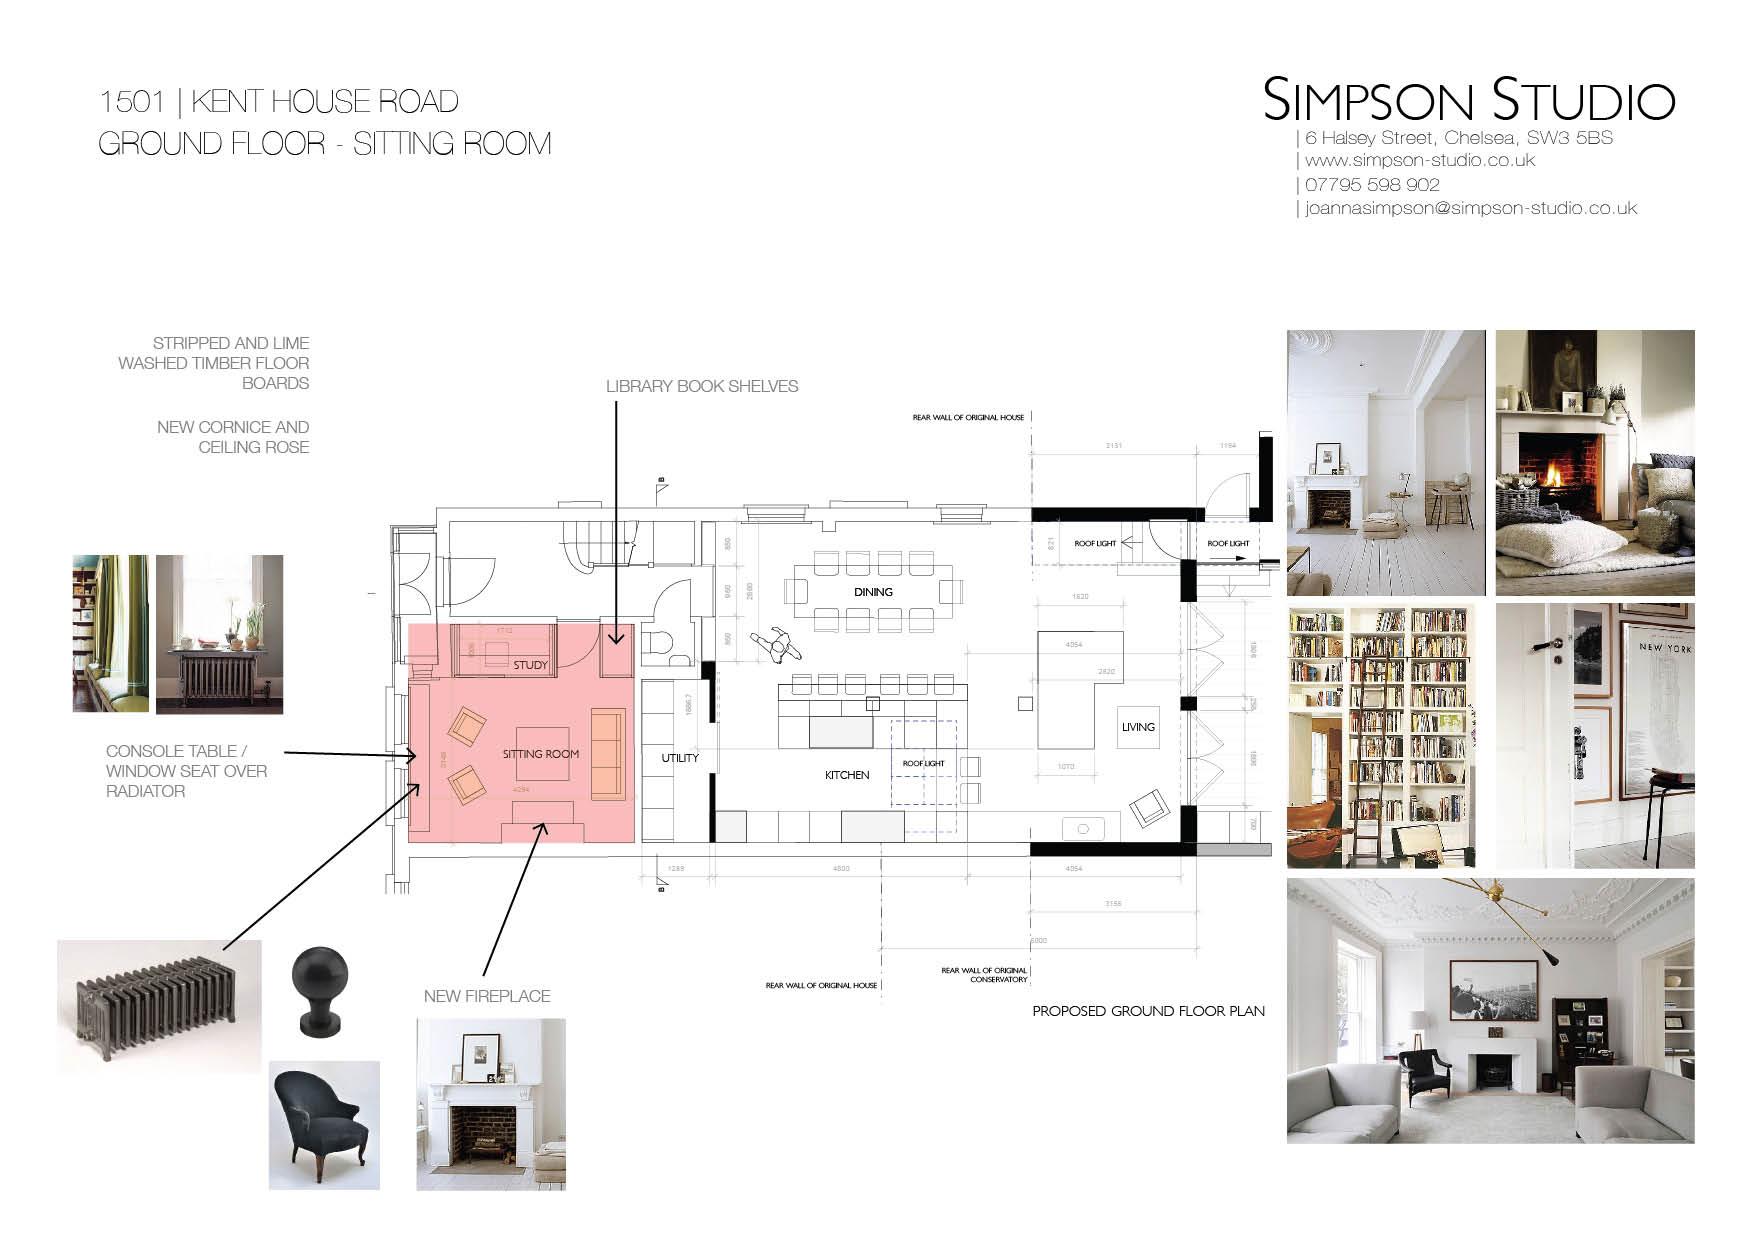 Kent House Road Room Planning3.jpg